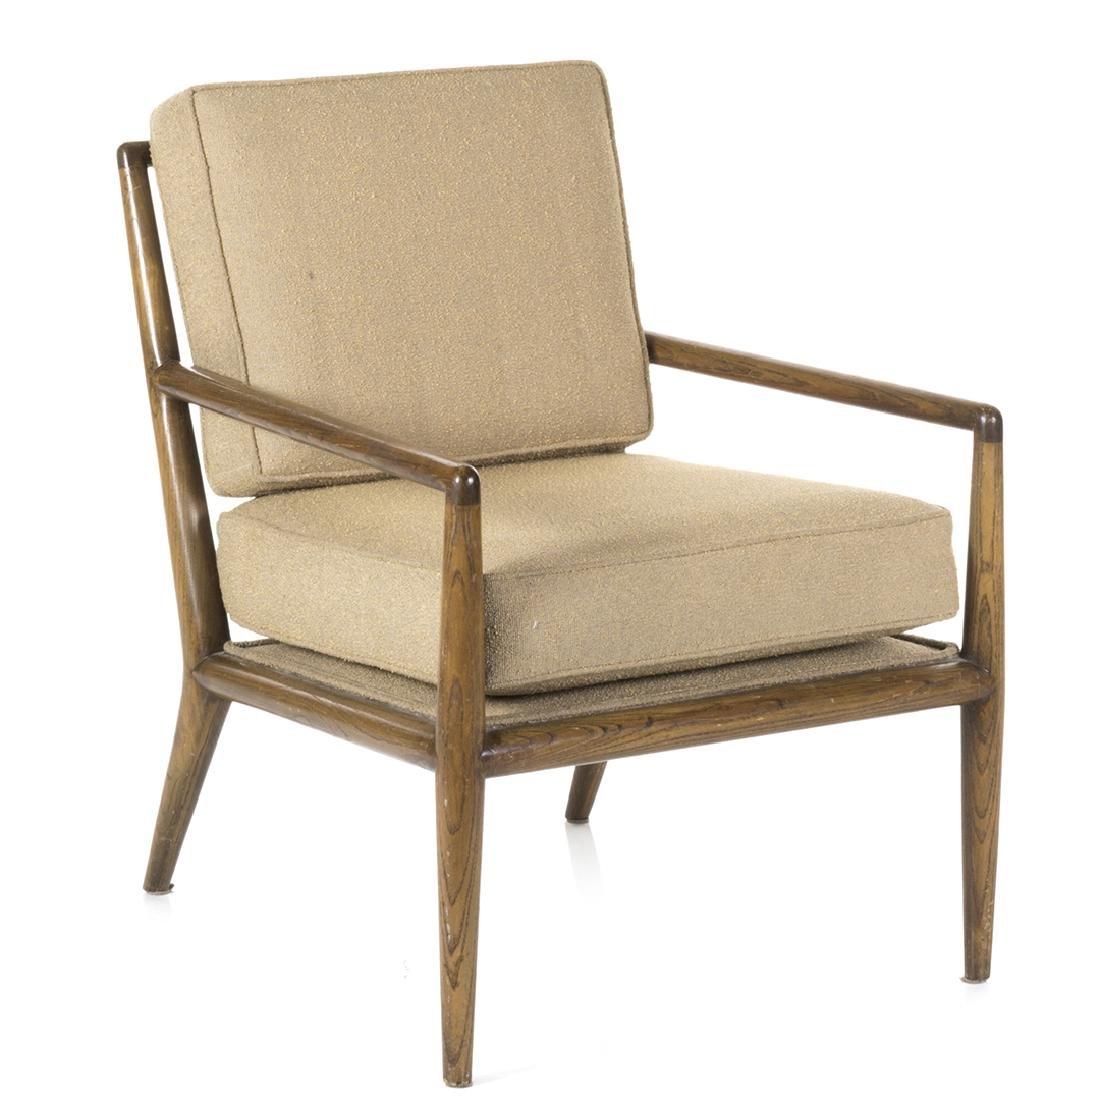 T.H. Robsjohn Gibbings Style Lounge Chair